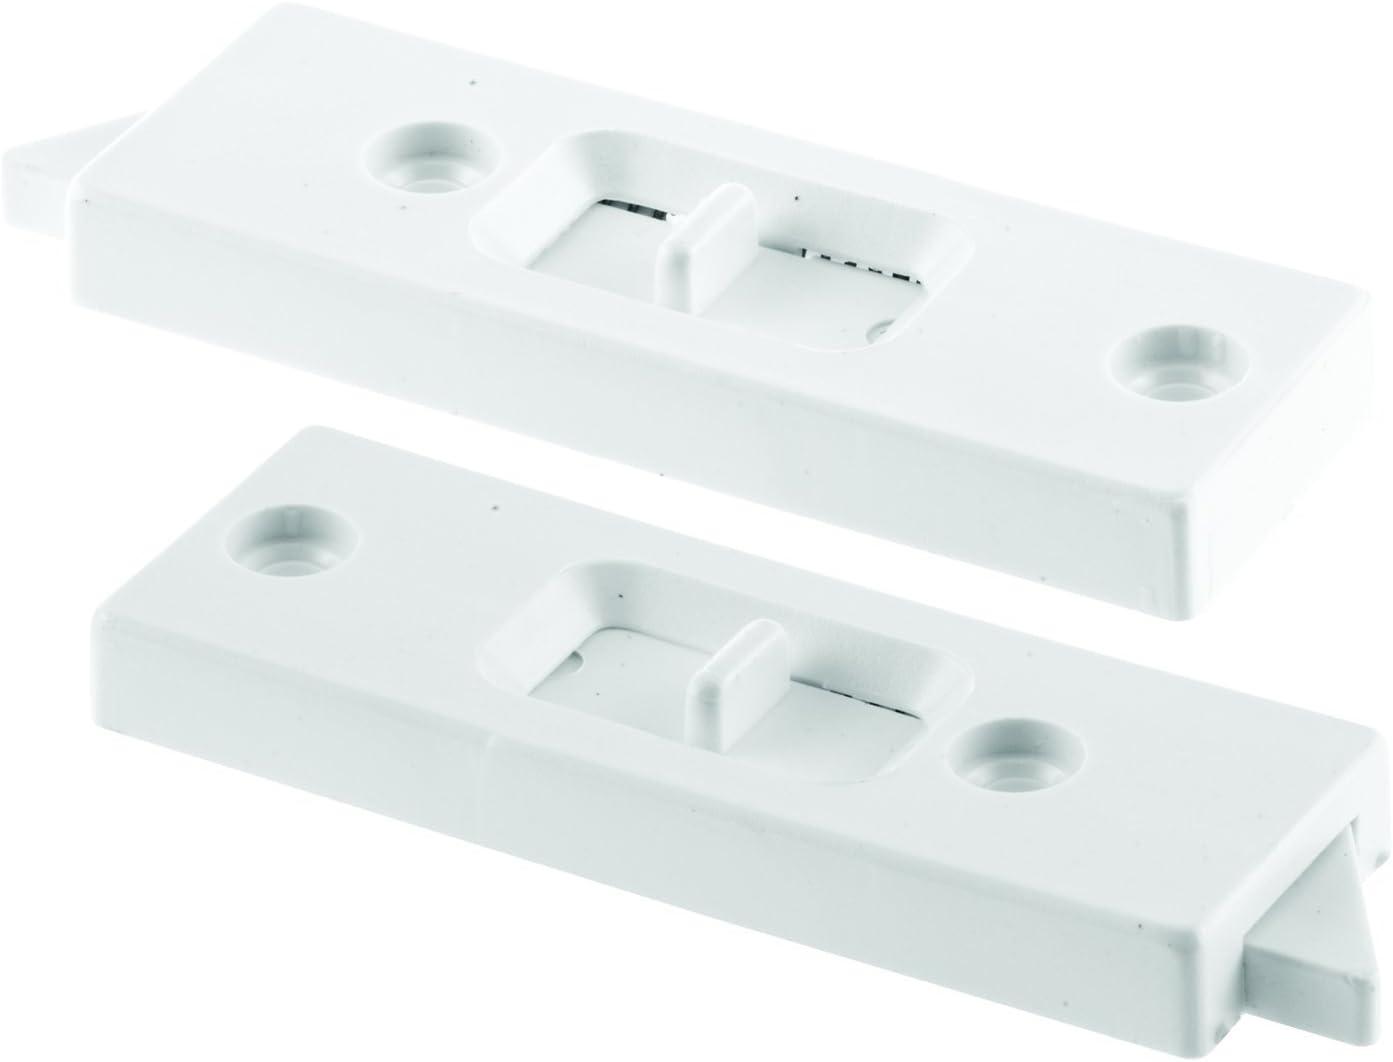 Prime-Line F 2598 Tilt Latch Construction Plastic Animer and price revision Pair Regular store S White